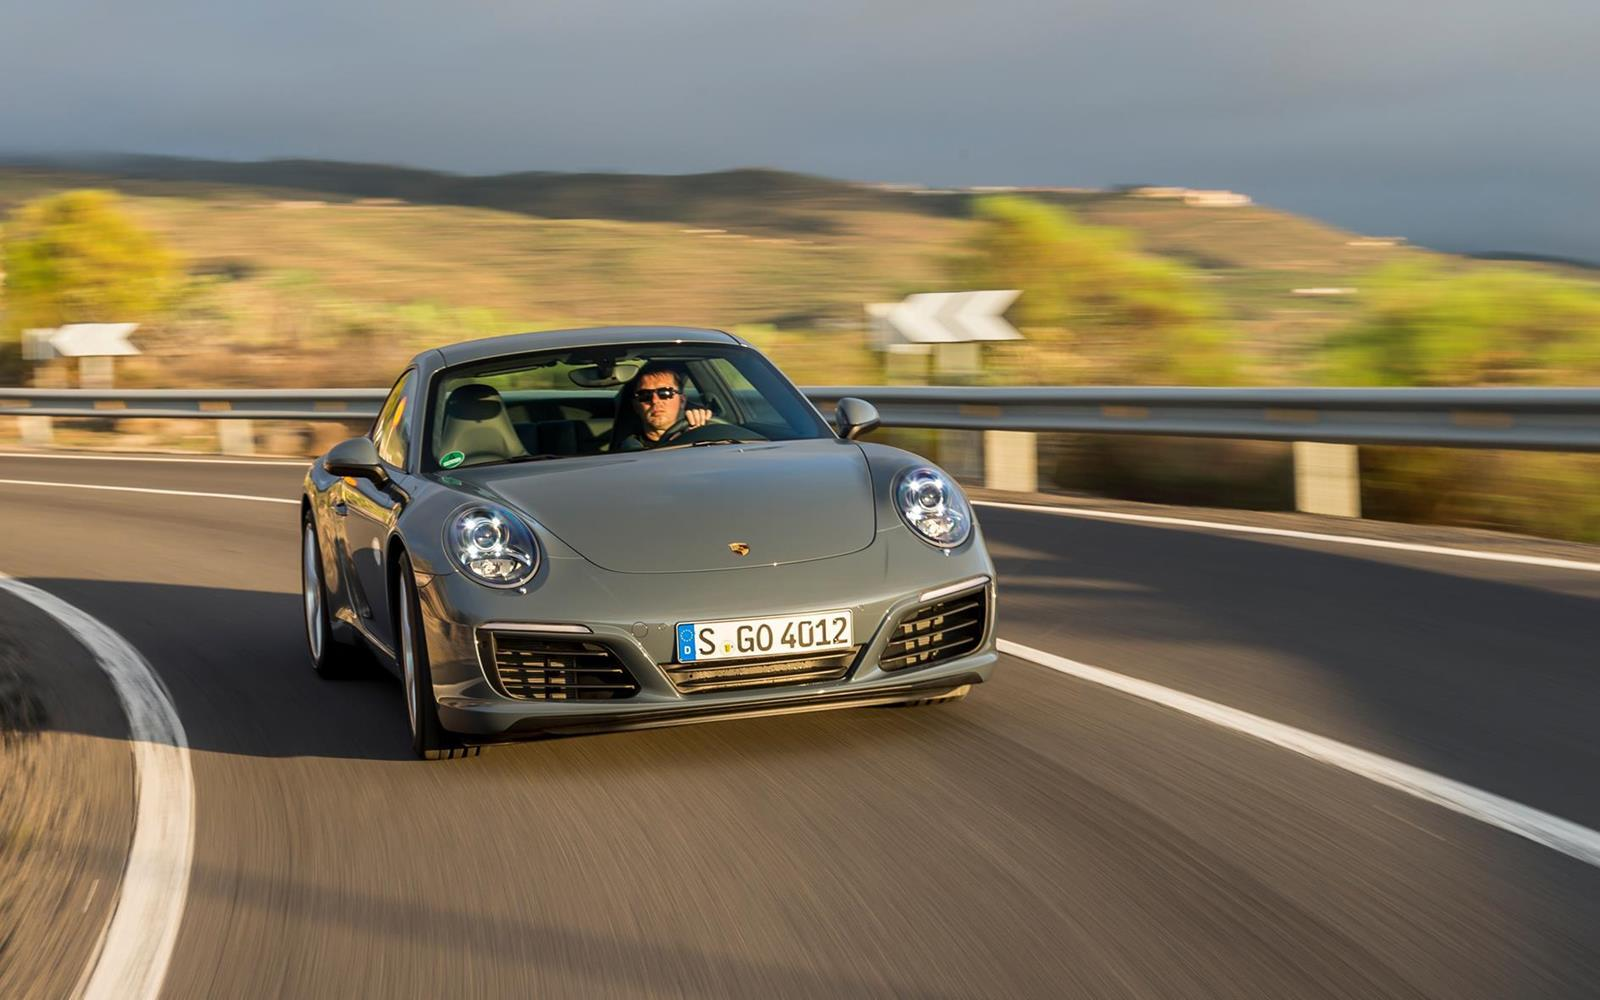 Porsche 911 Carrera 2015 Dynamic Front Clear